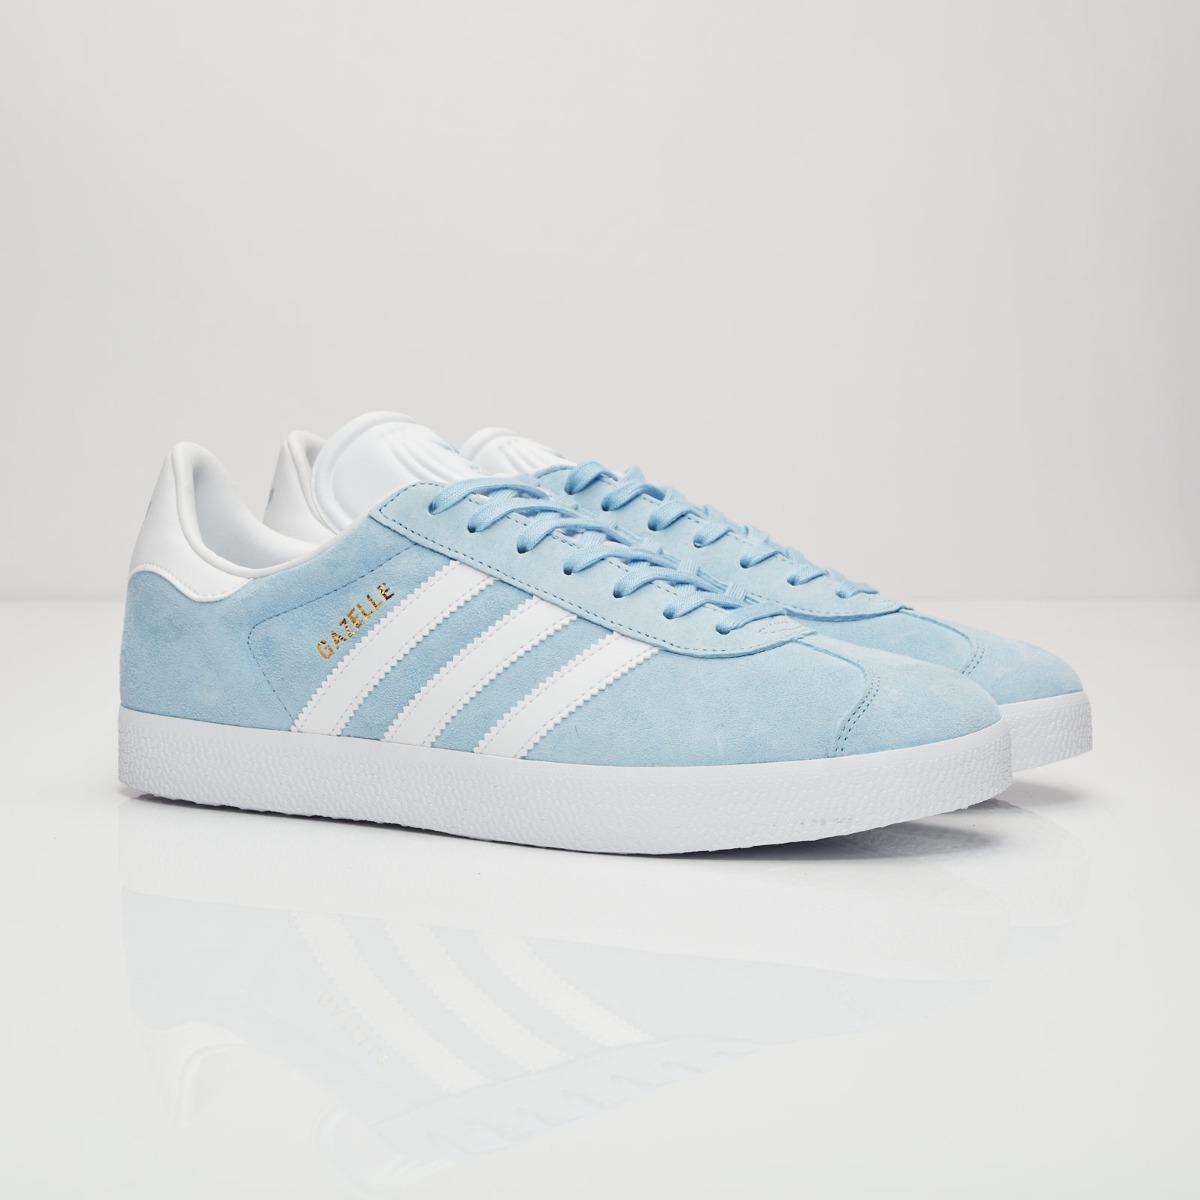 adidas gazelle mujer azul claro